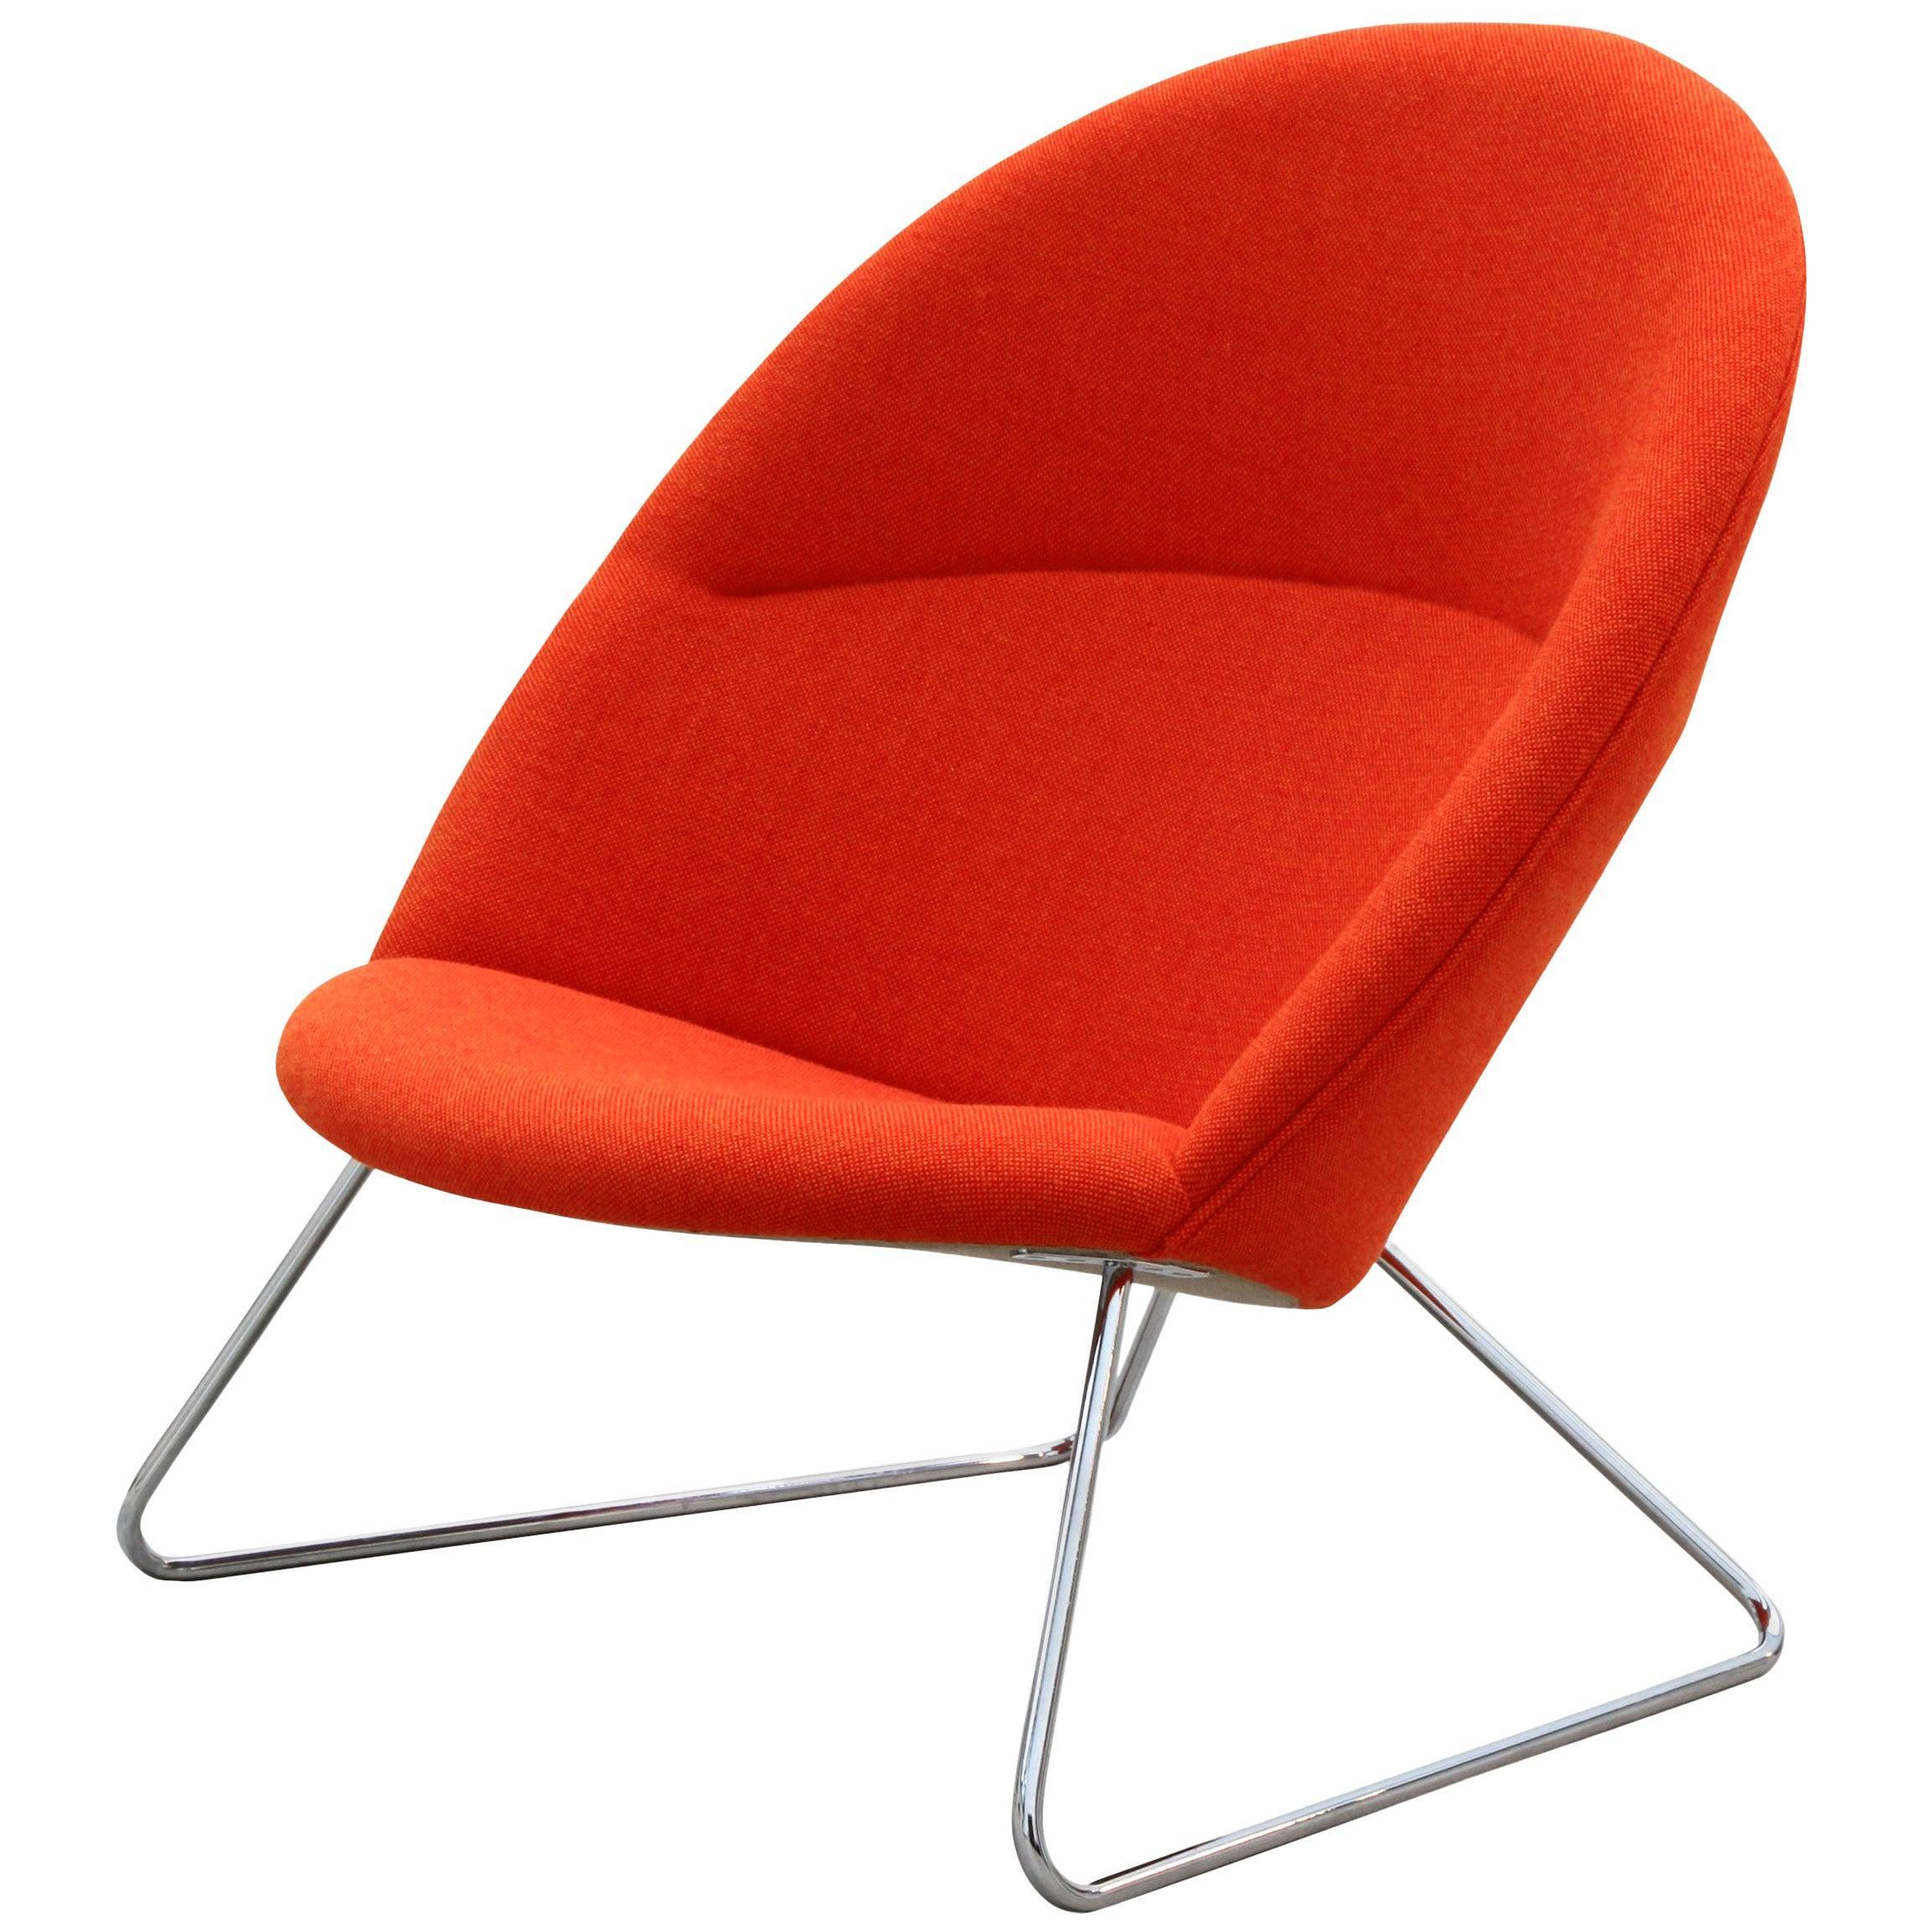 Nanna Ditzel & Jørgen Ditzel, Red Dennie Chair by One Collection